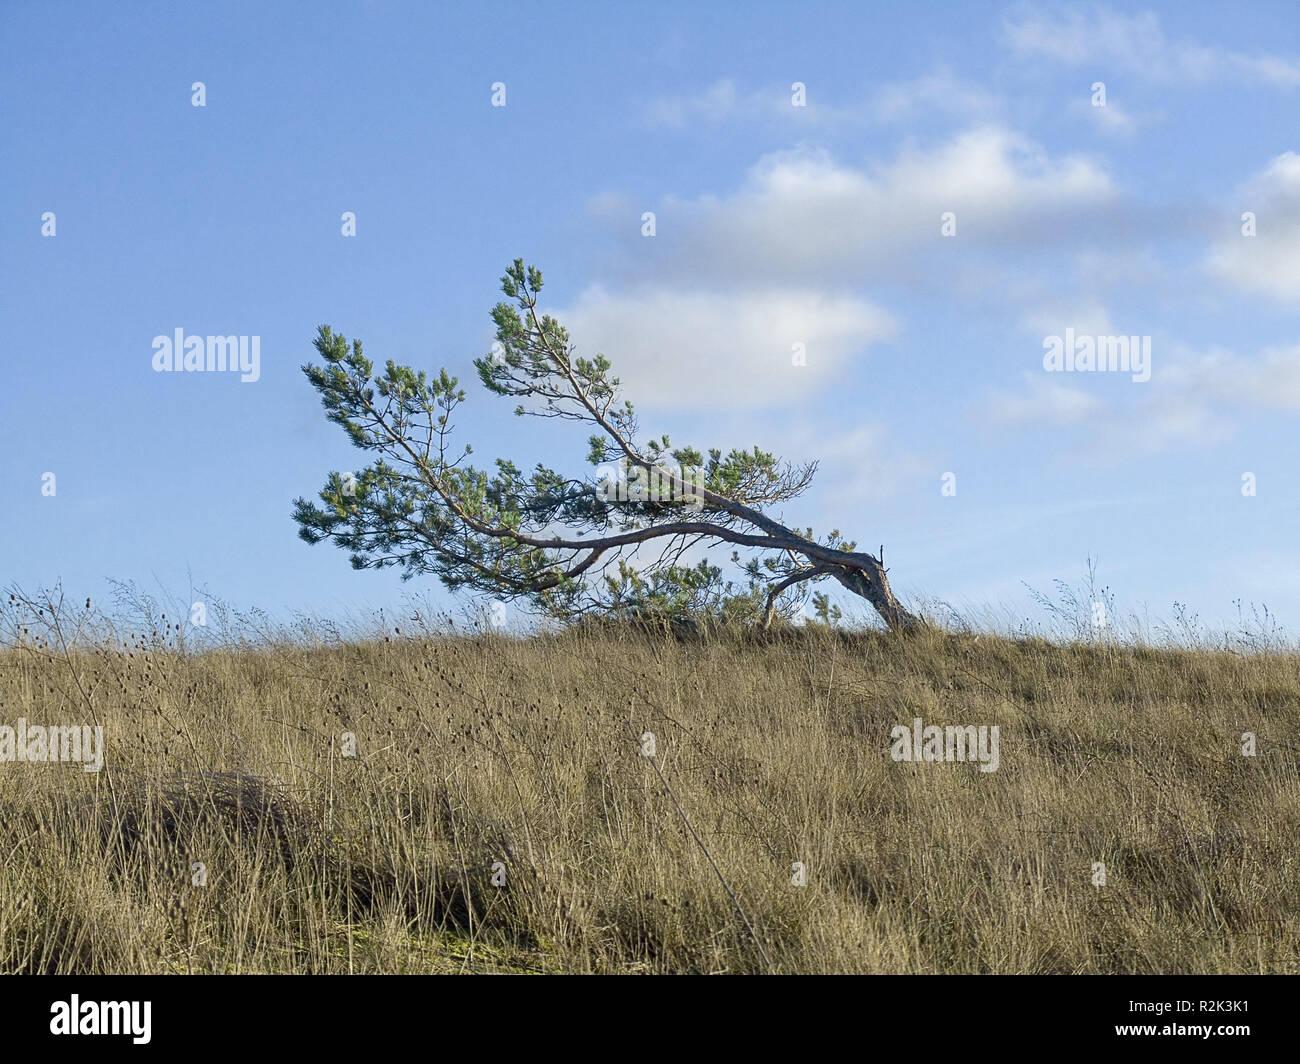 Natur, Landschaft, Baum, single, einsame Baum, schräg, windswept, Stockbild